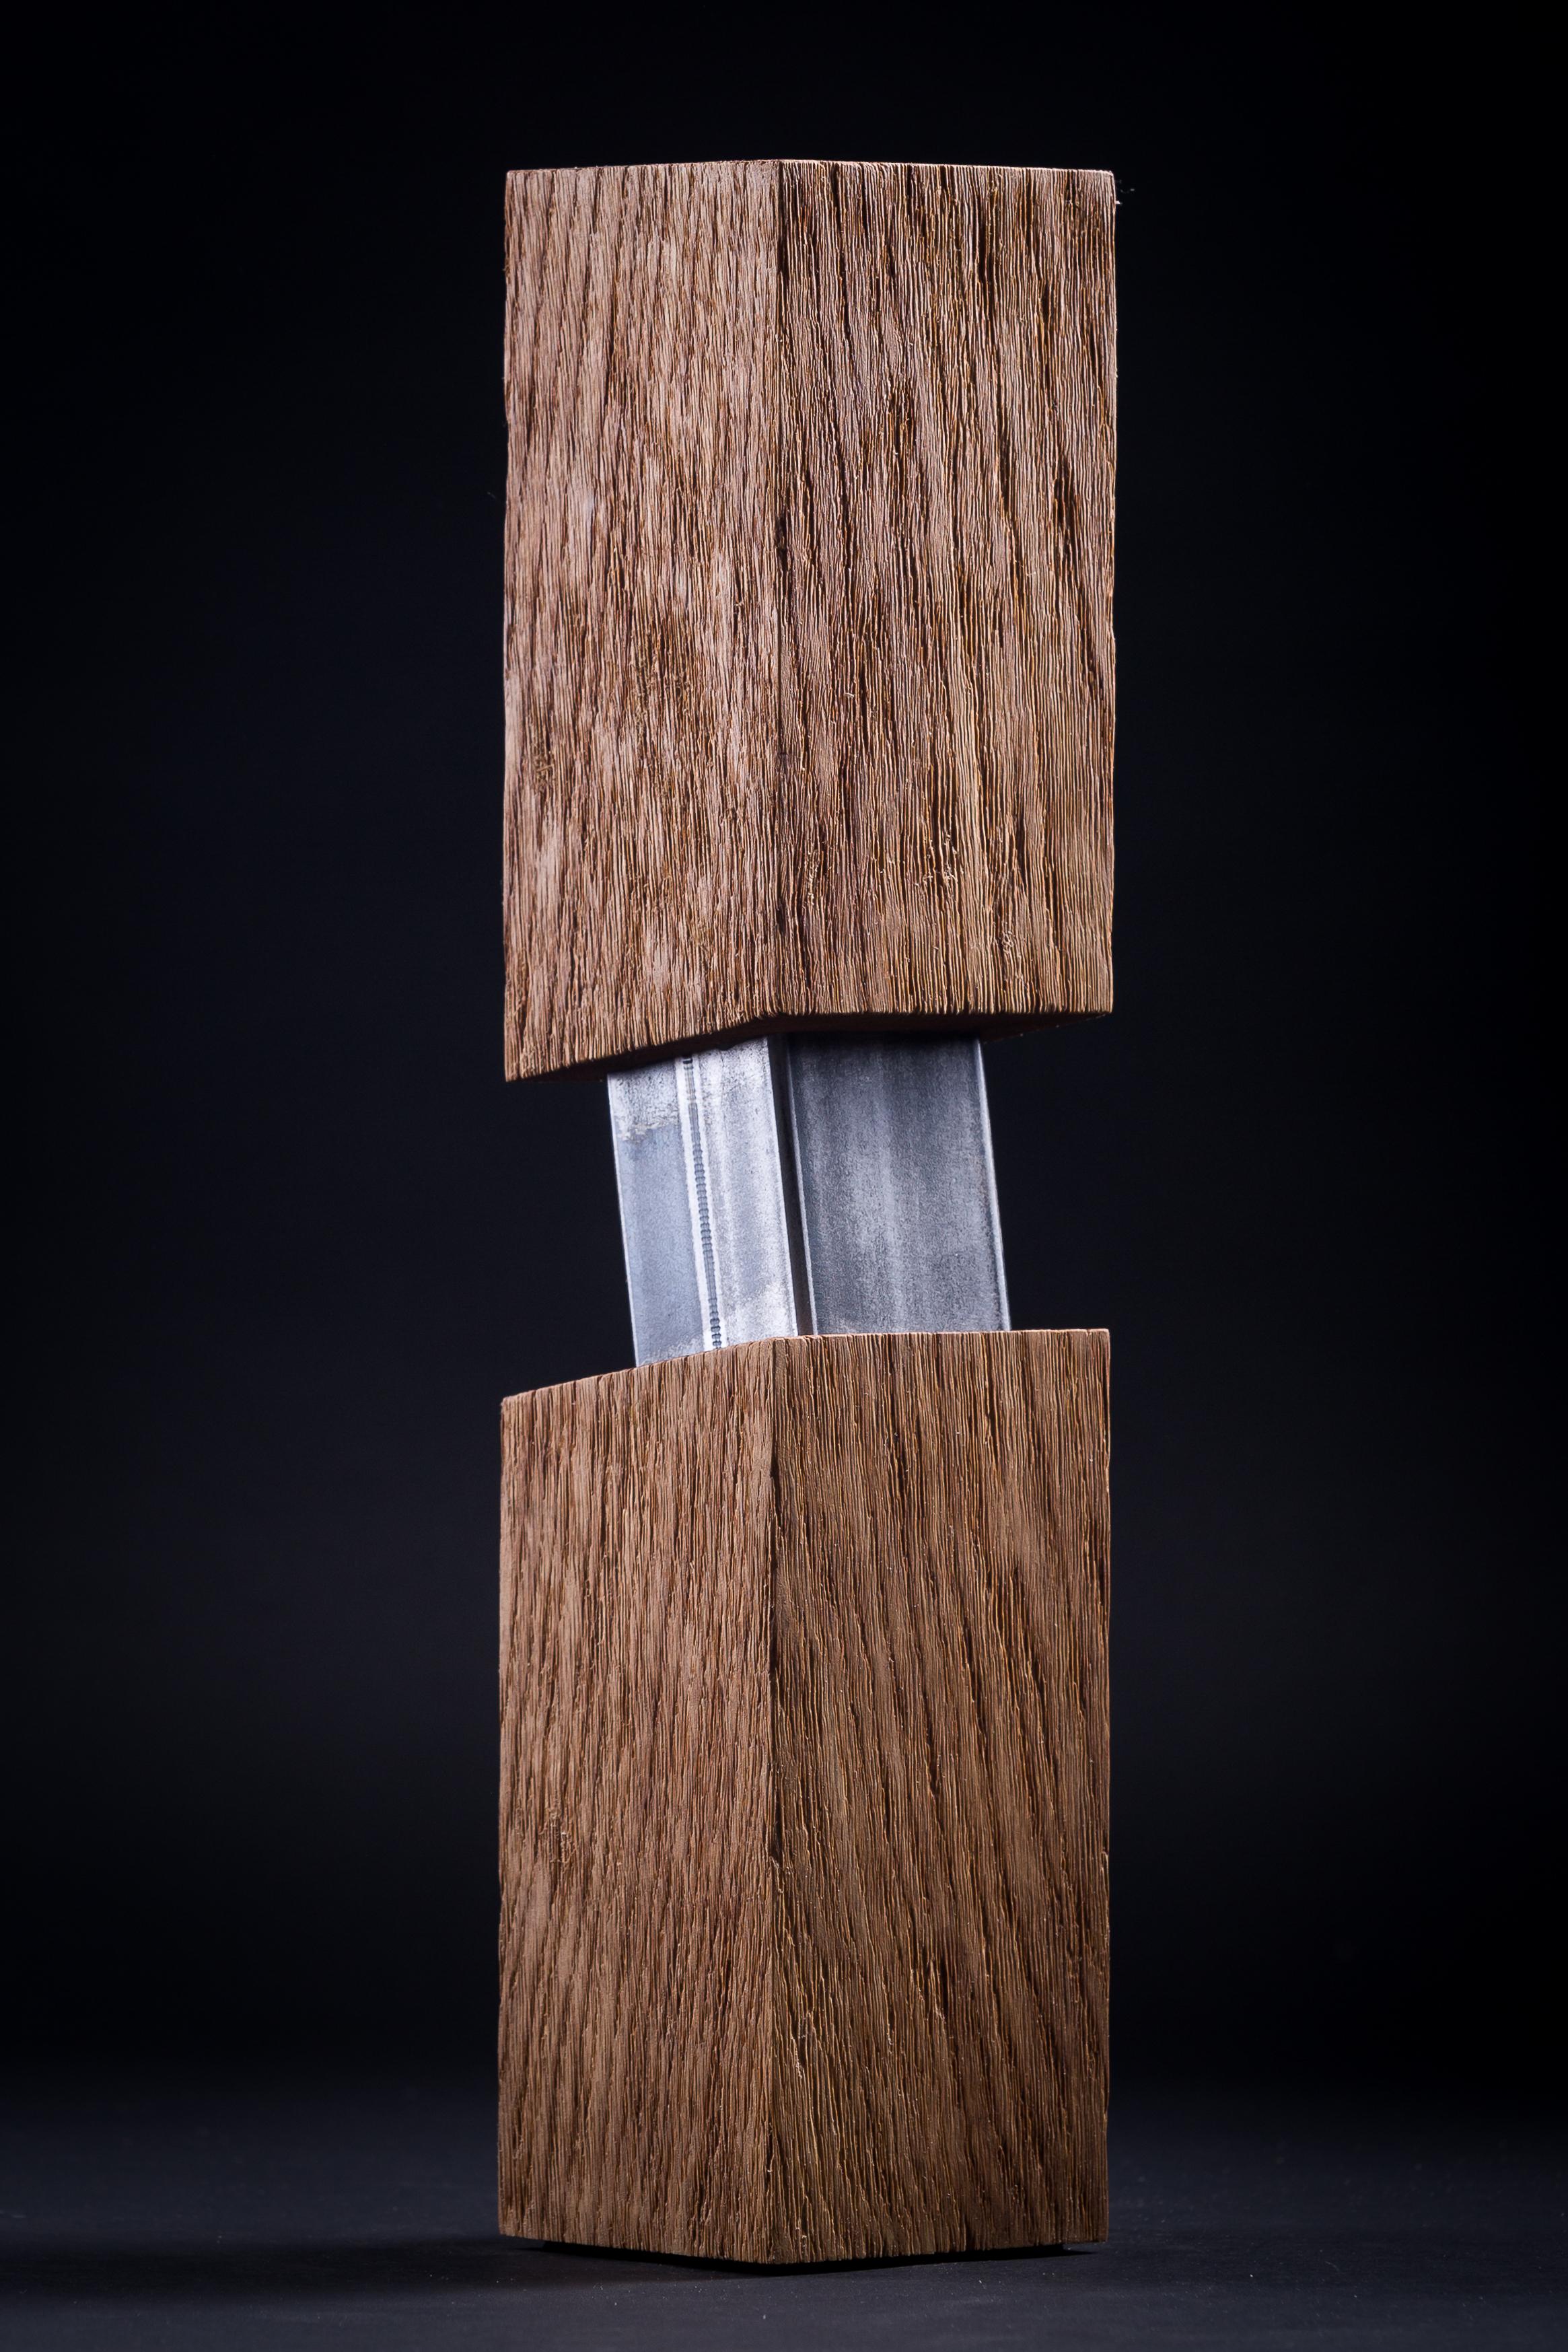 Sculpture Petite Équilibre